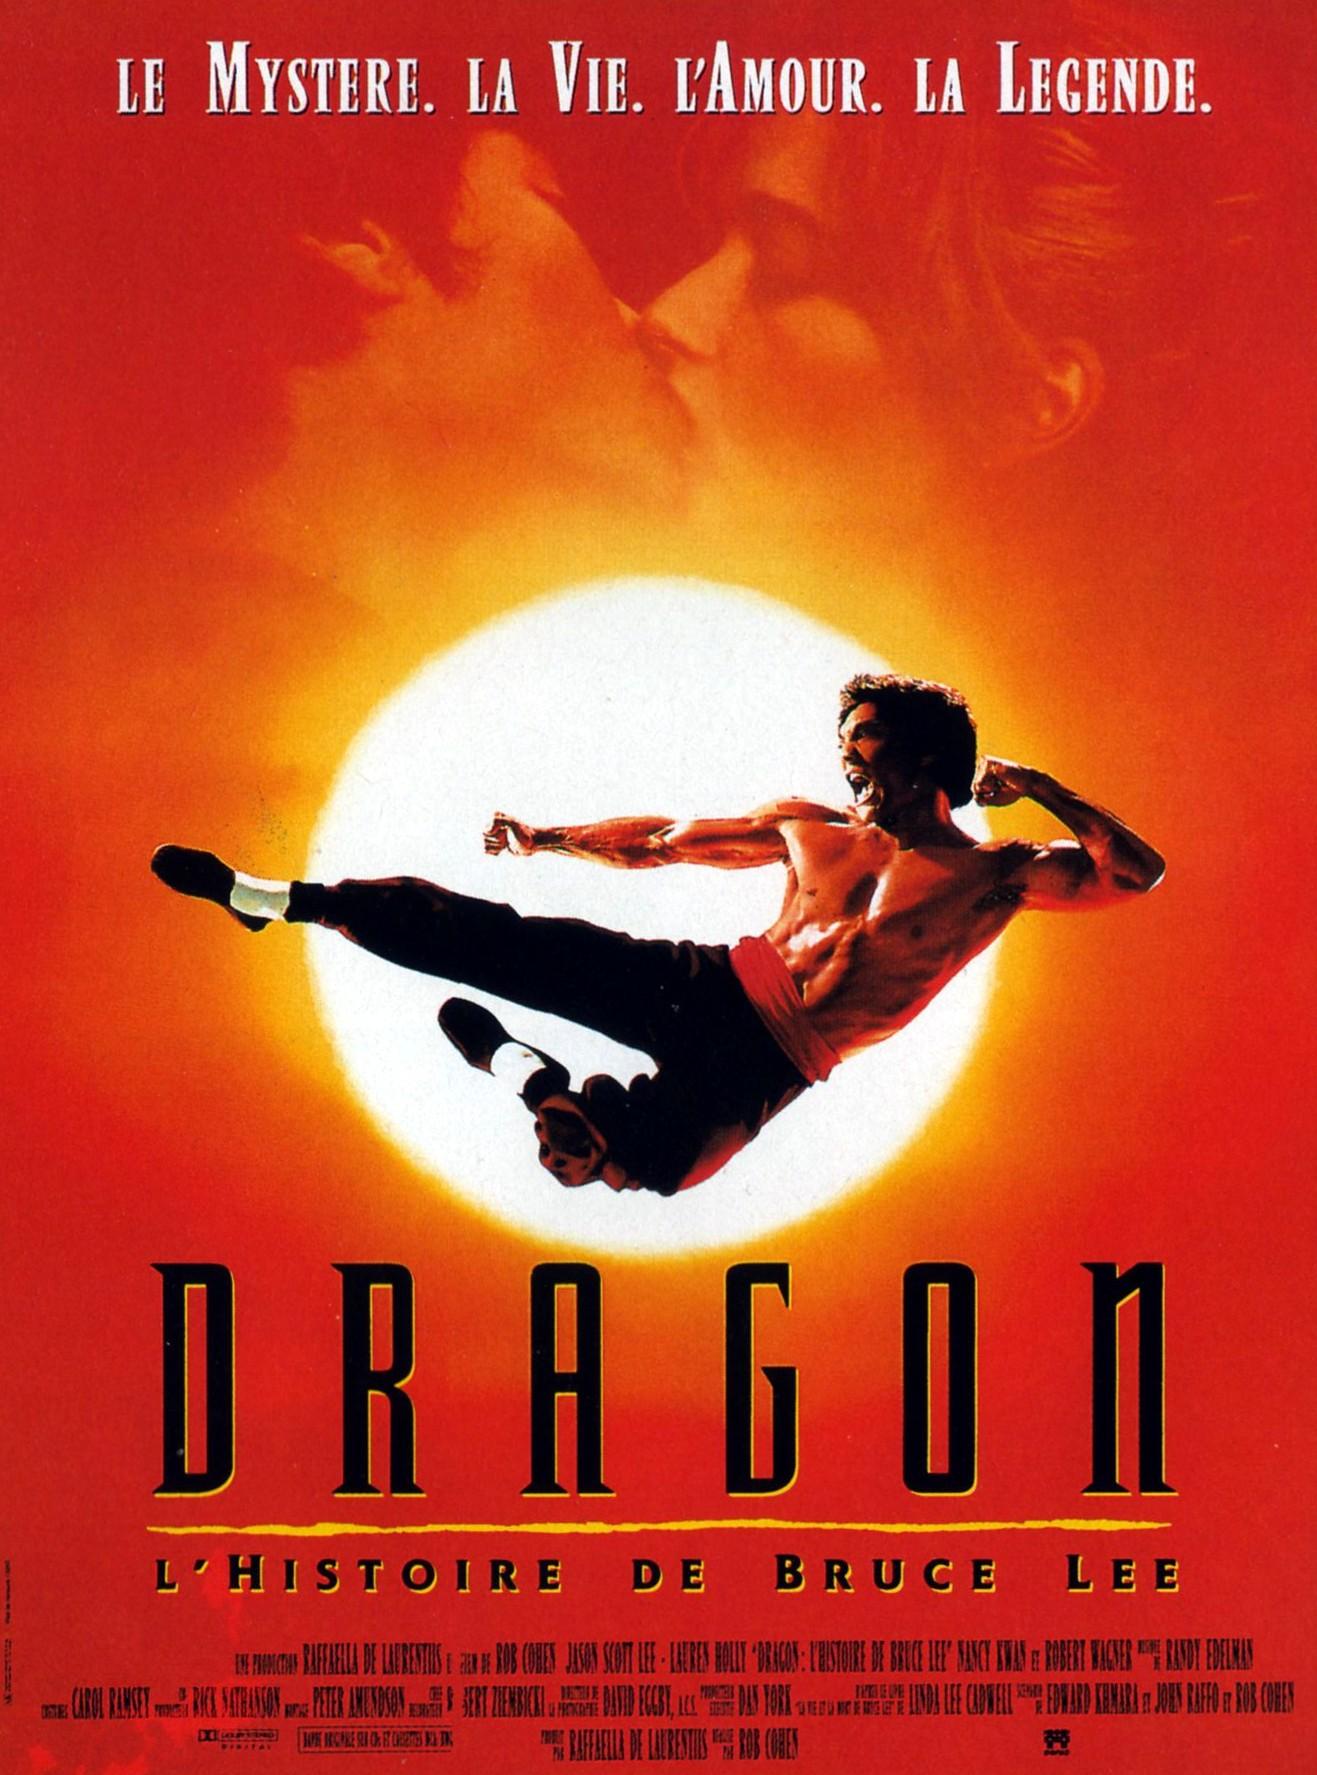 Lee (Dragón: la historia de Bruce Lee) (Dragon: The Bruce Lee Story